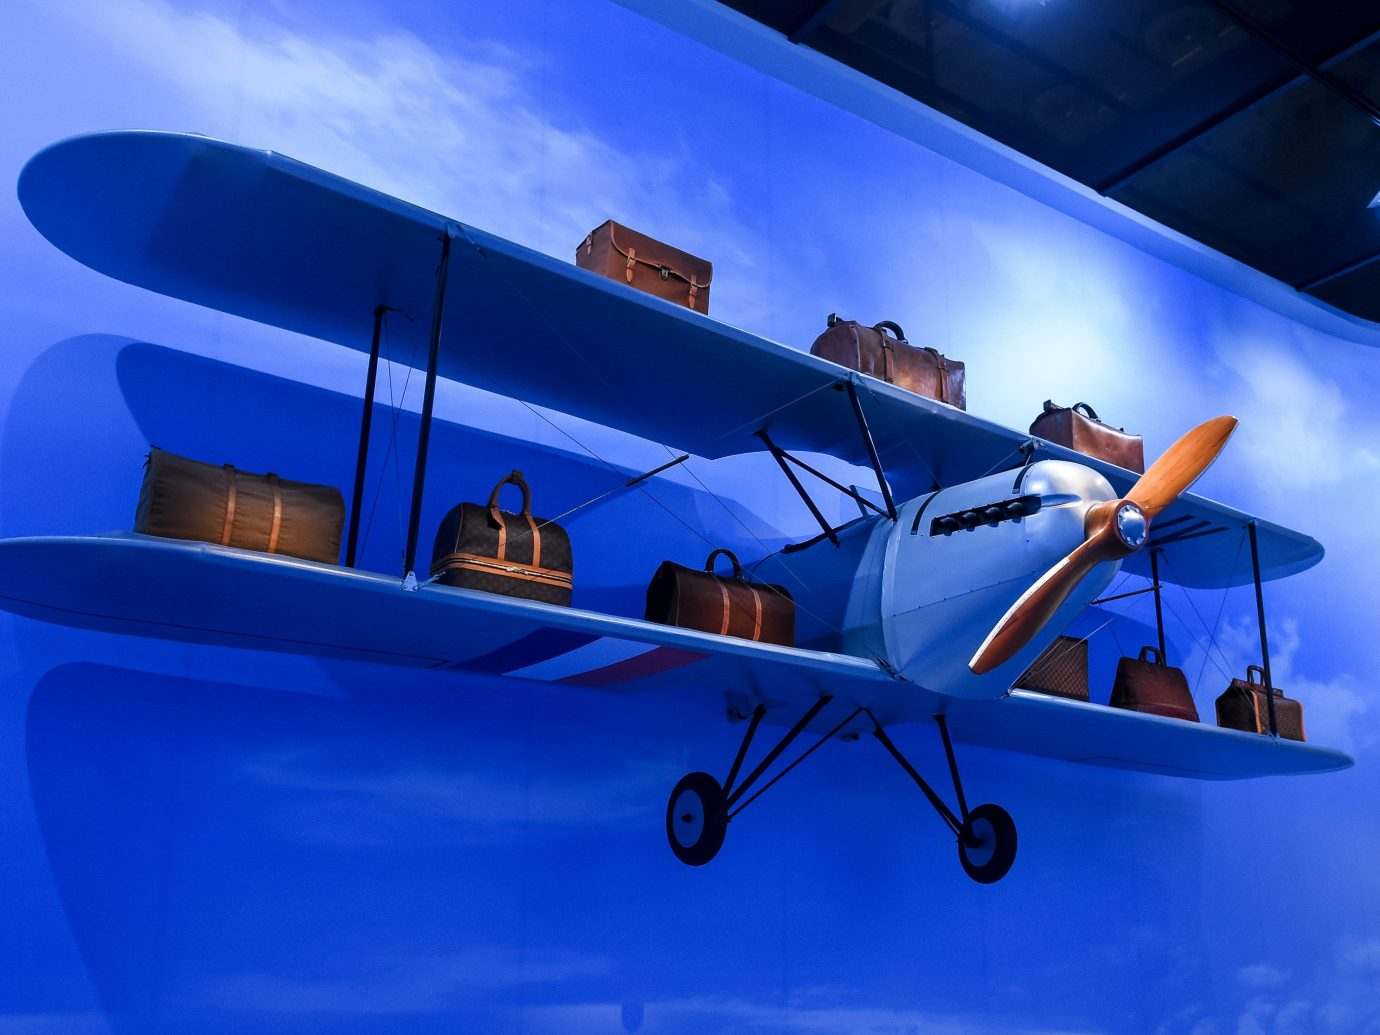 News Style + Design sky blue airplane aircraft plane aviation air travel aerospace engineering light aircraft wing propeller biplane propeller driven aircraft flight general aviation monoplane computer wallpaper engine